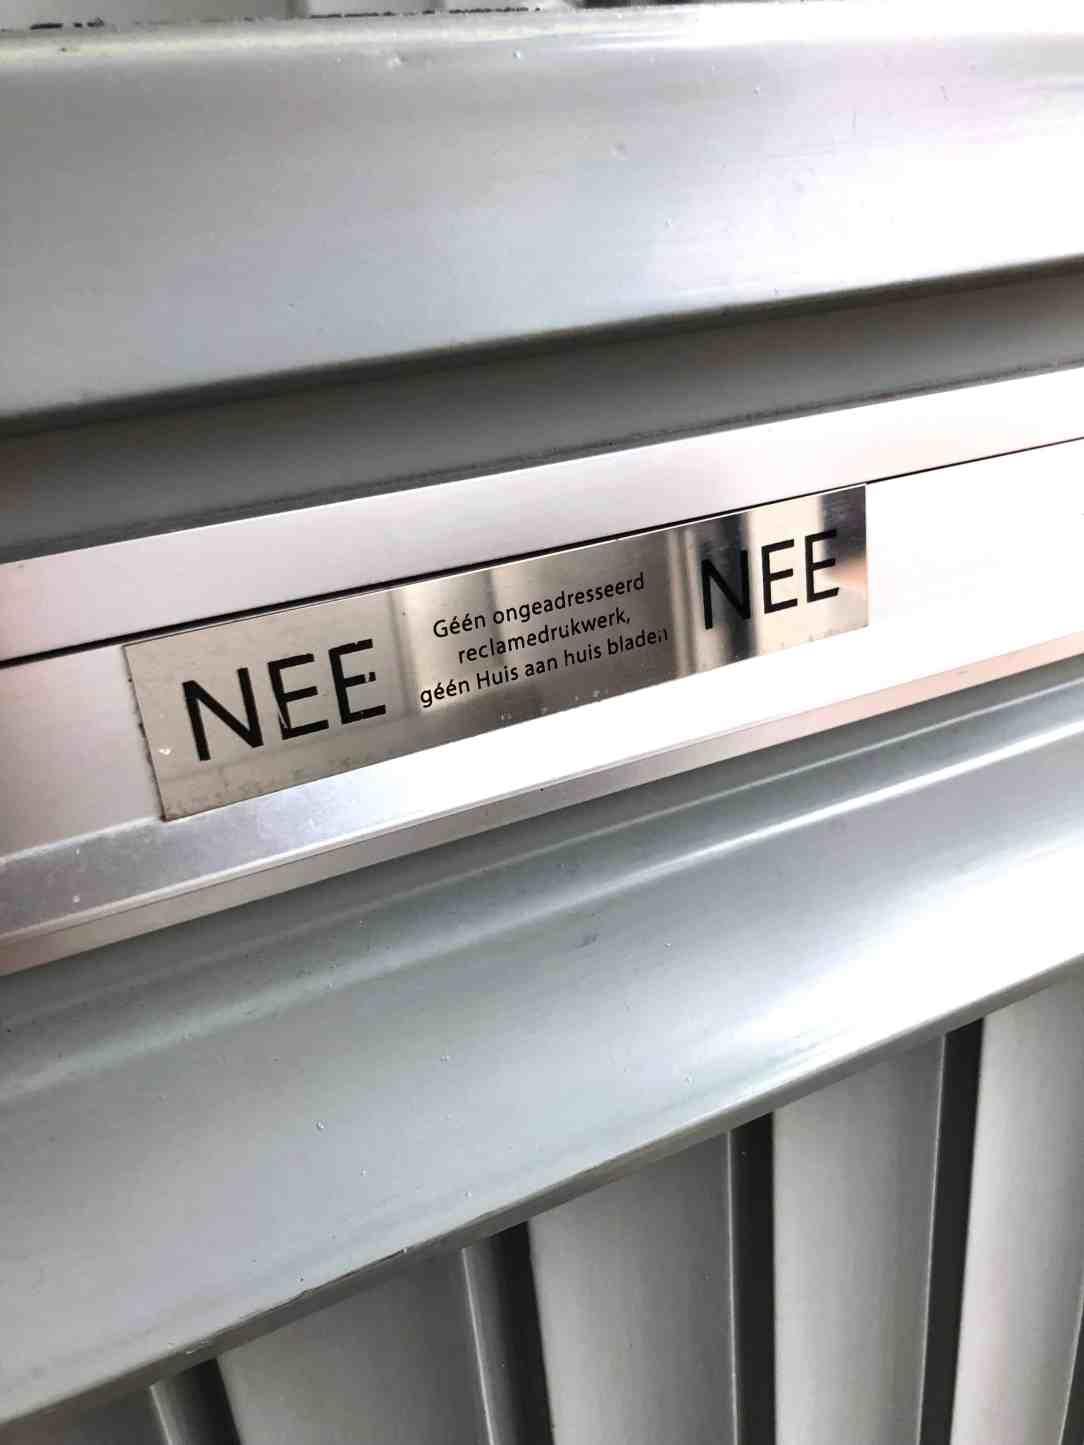 opgeruimd huis-nee/nee sticker